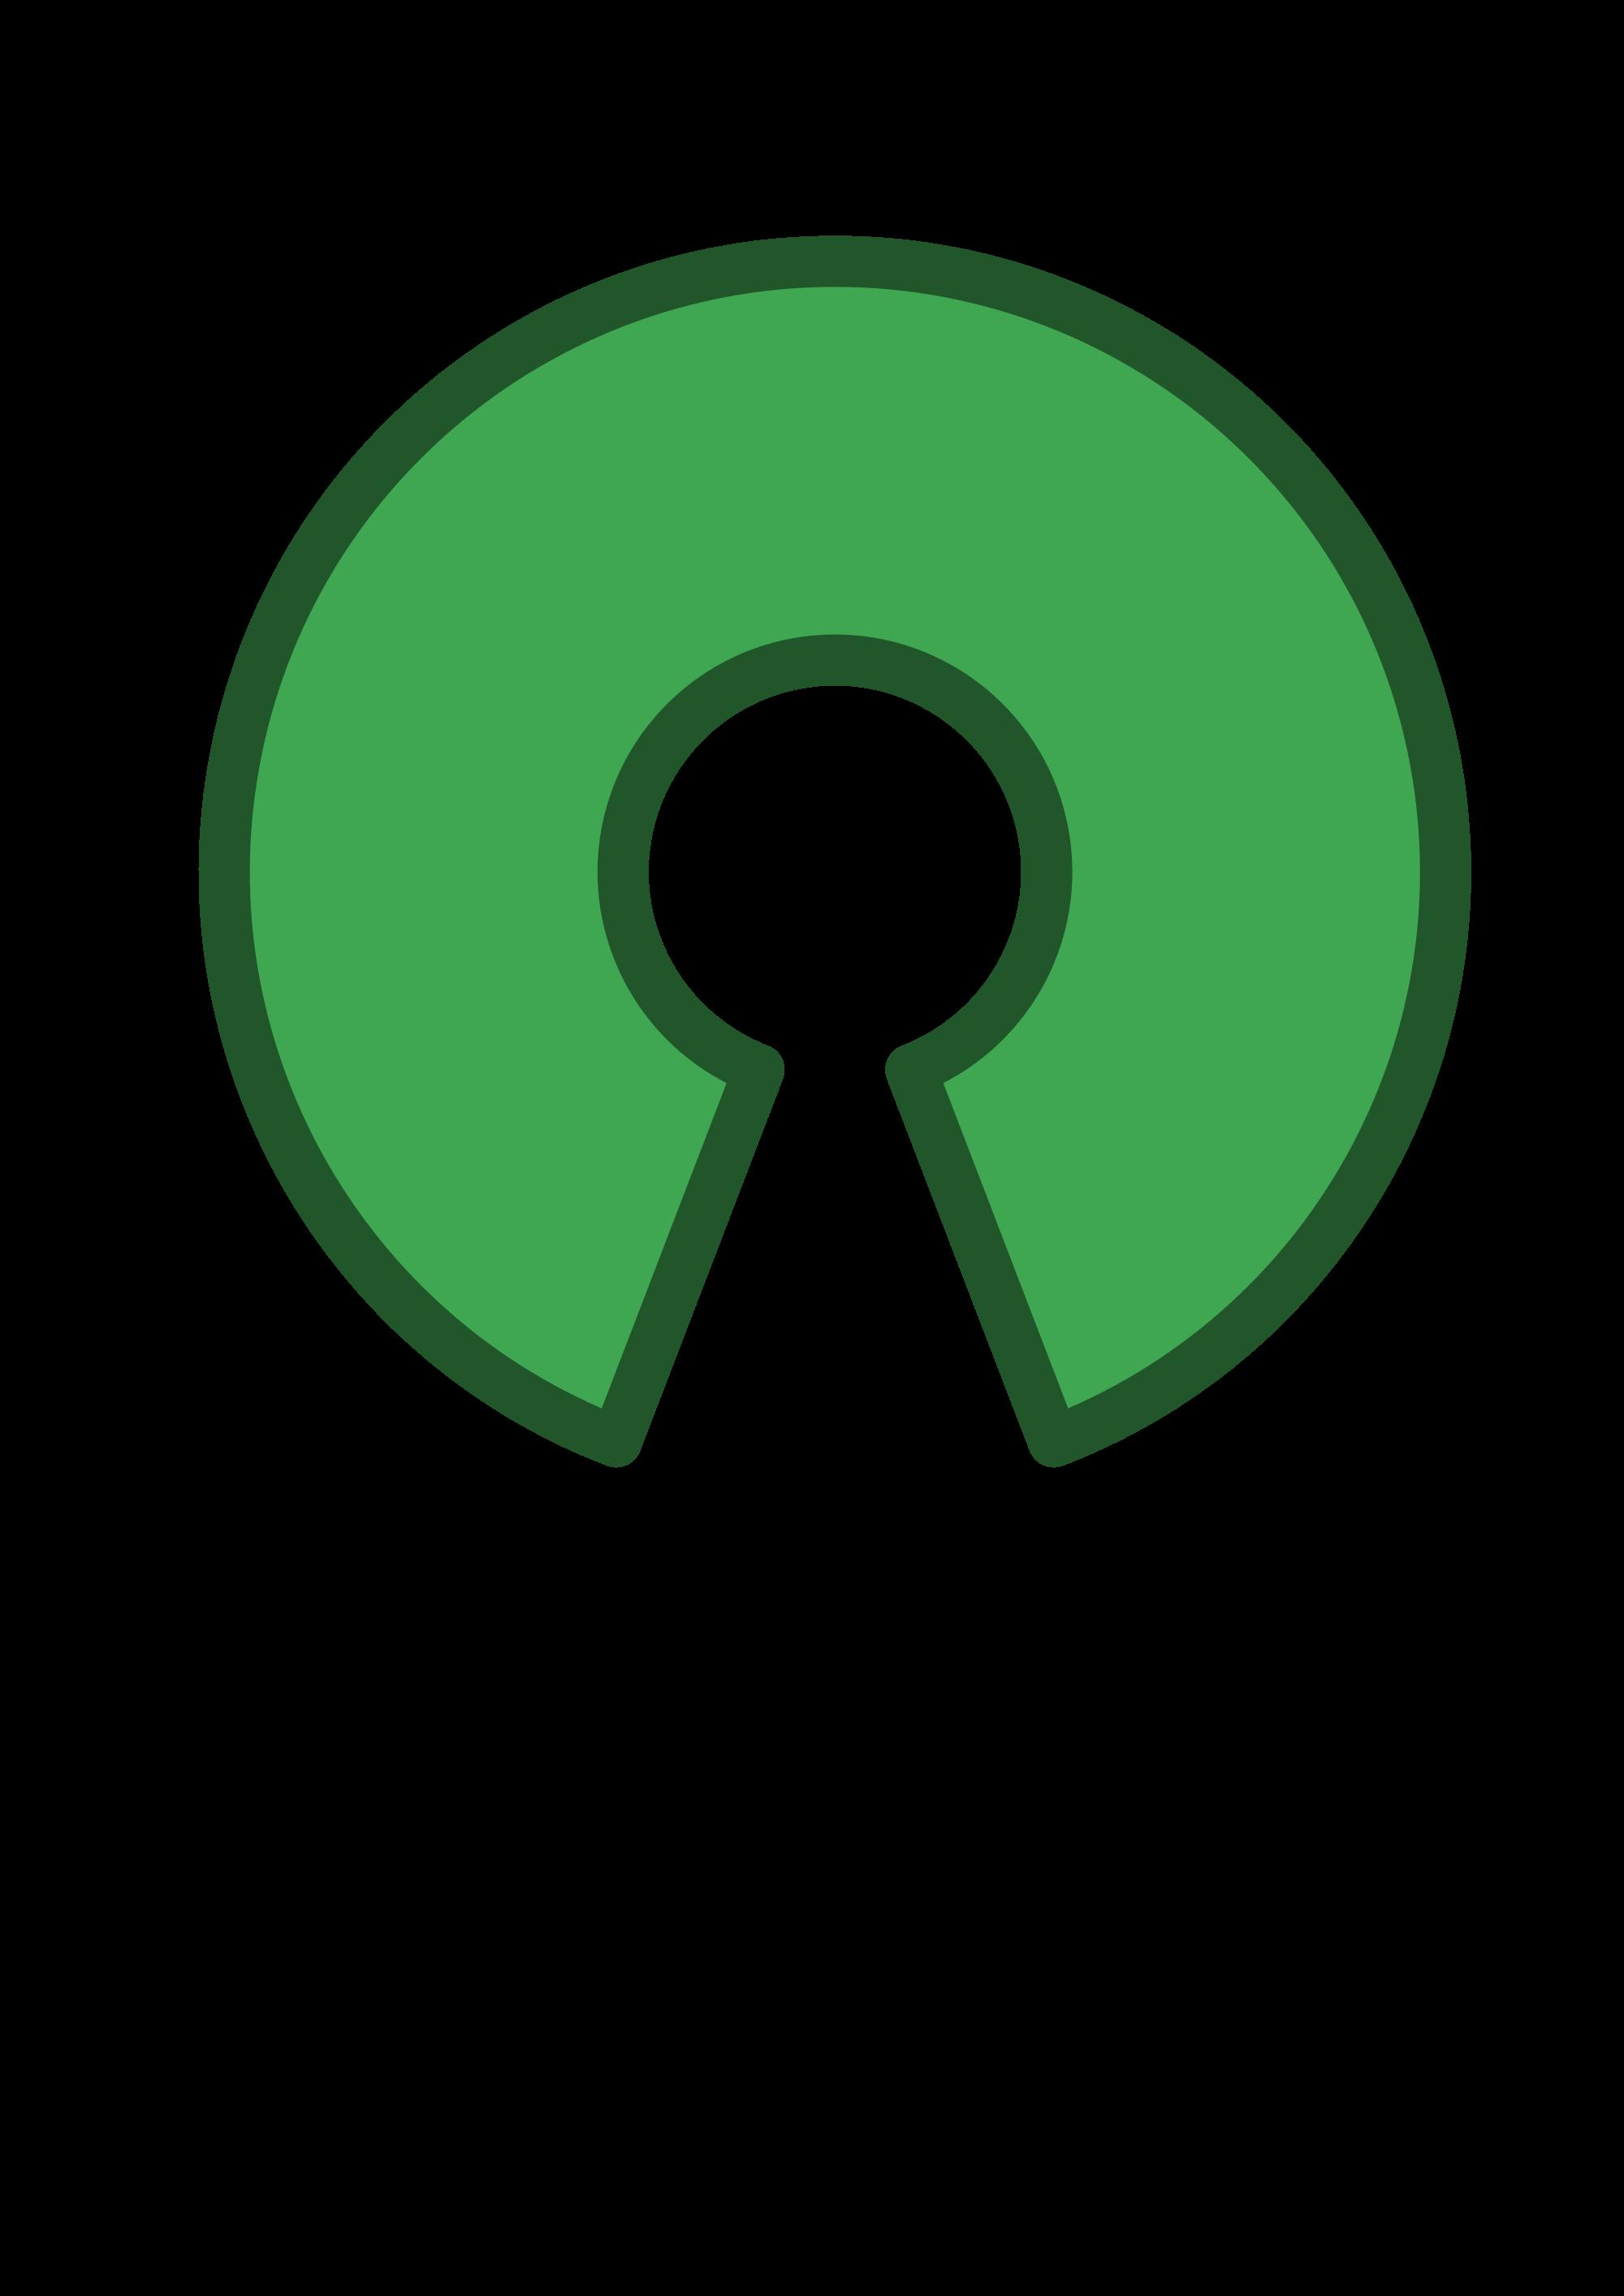 web_gis_Opensource